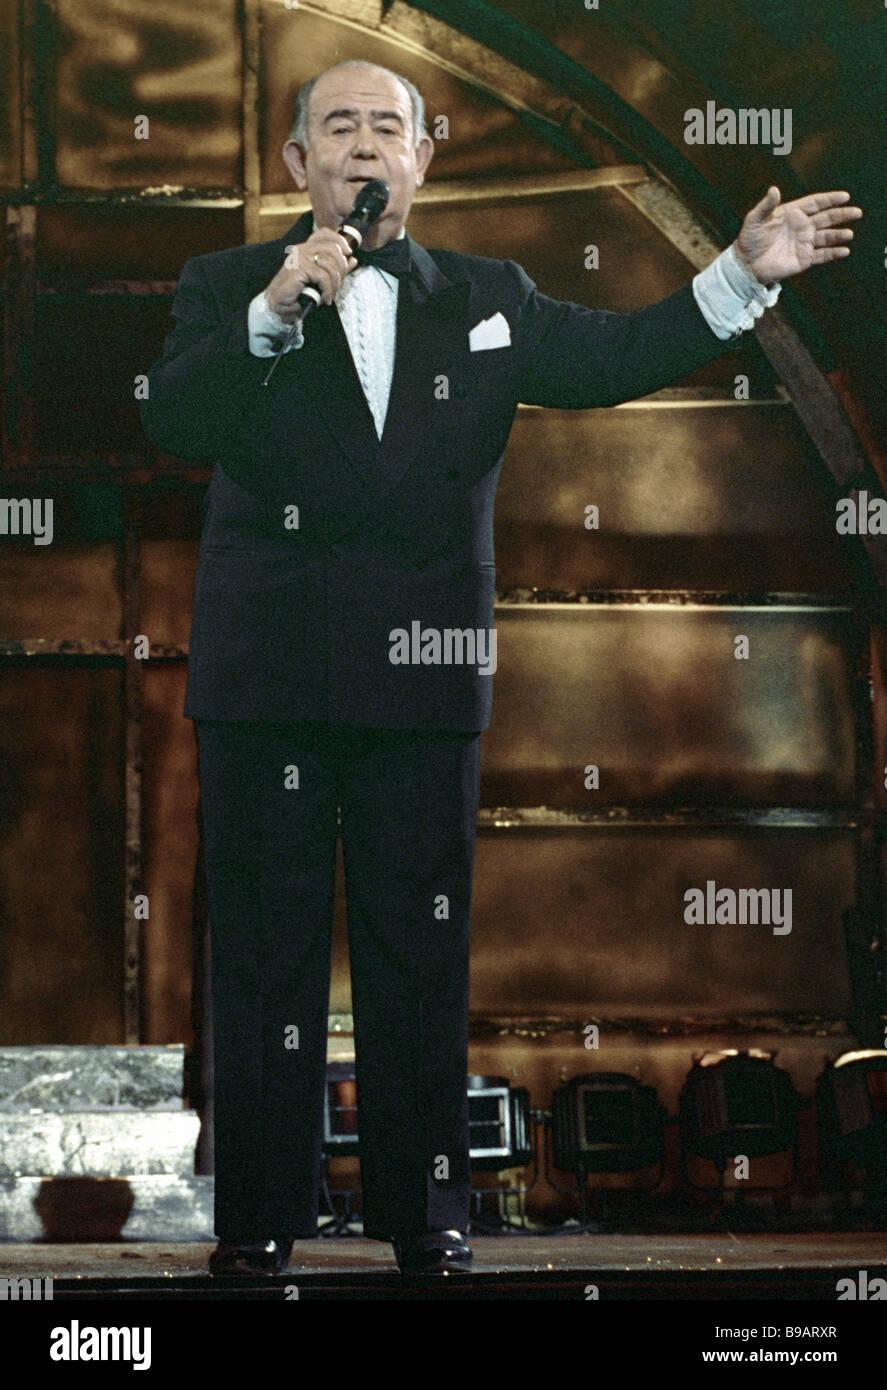 Master of ceremonies Boris Brunov at concert - Stock Image